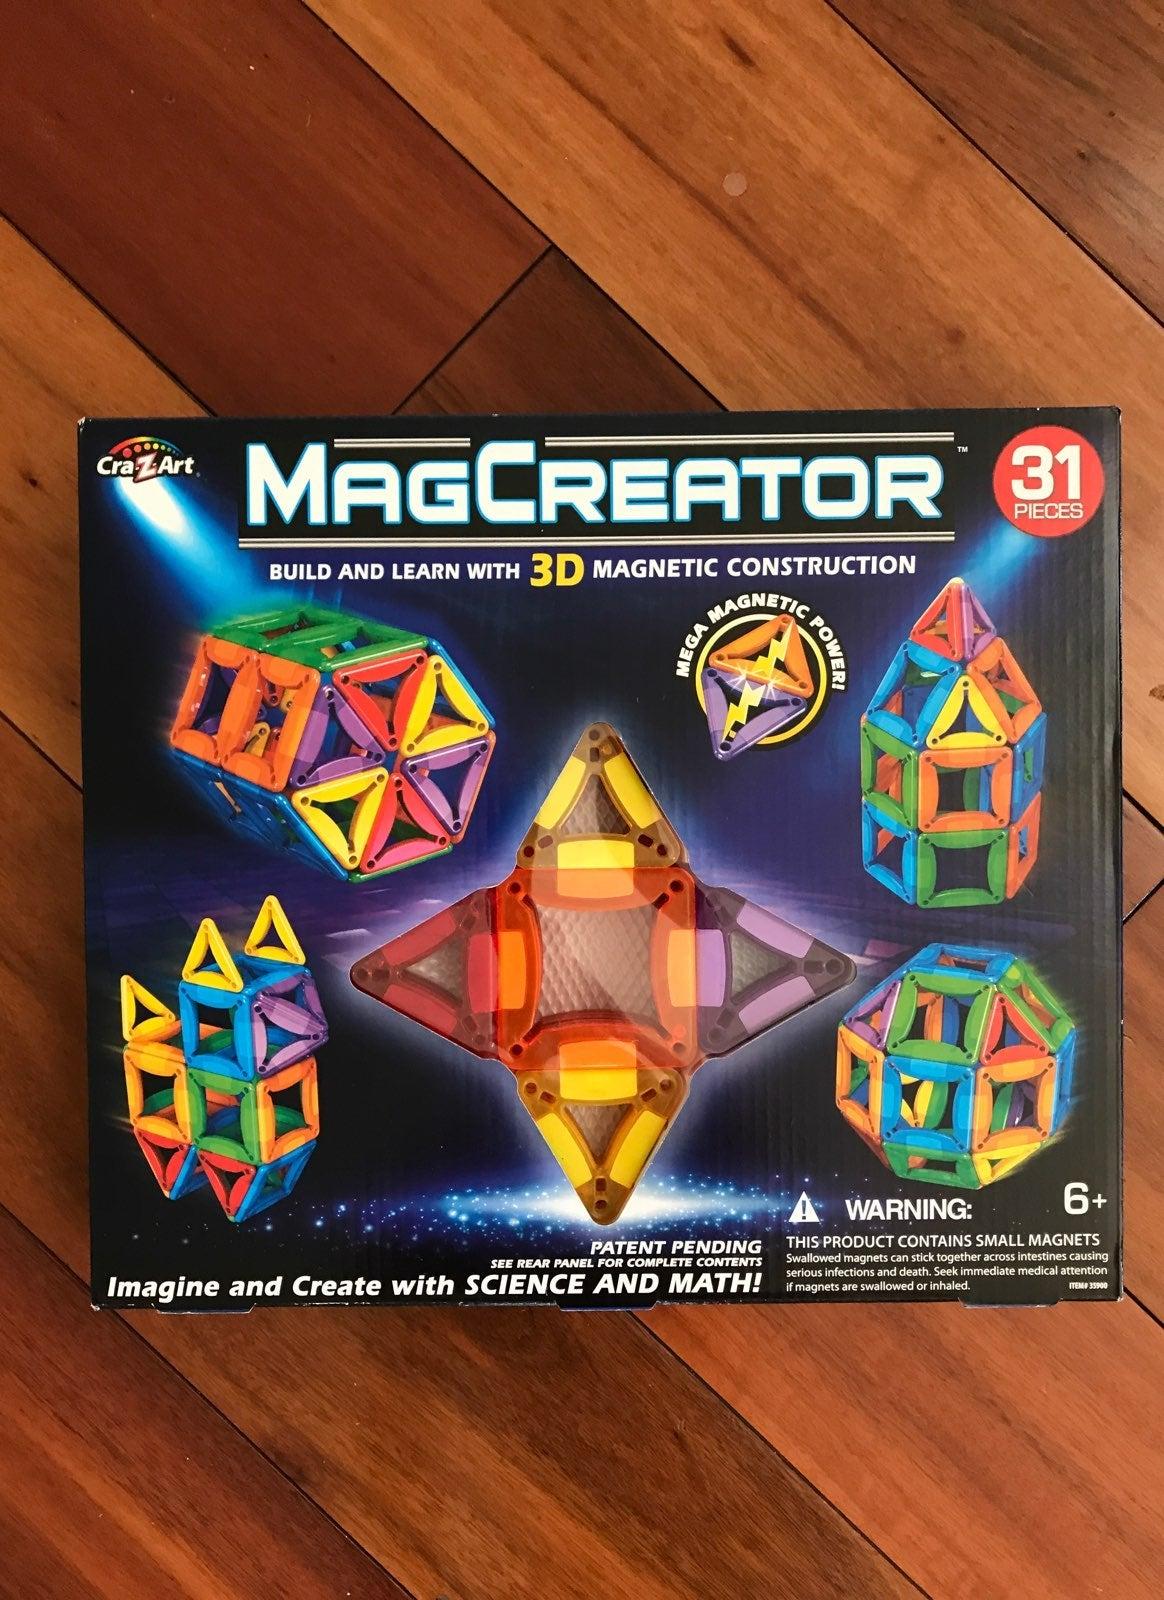 MagCreator 3-D Magnetic Construction 31